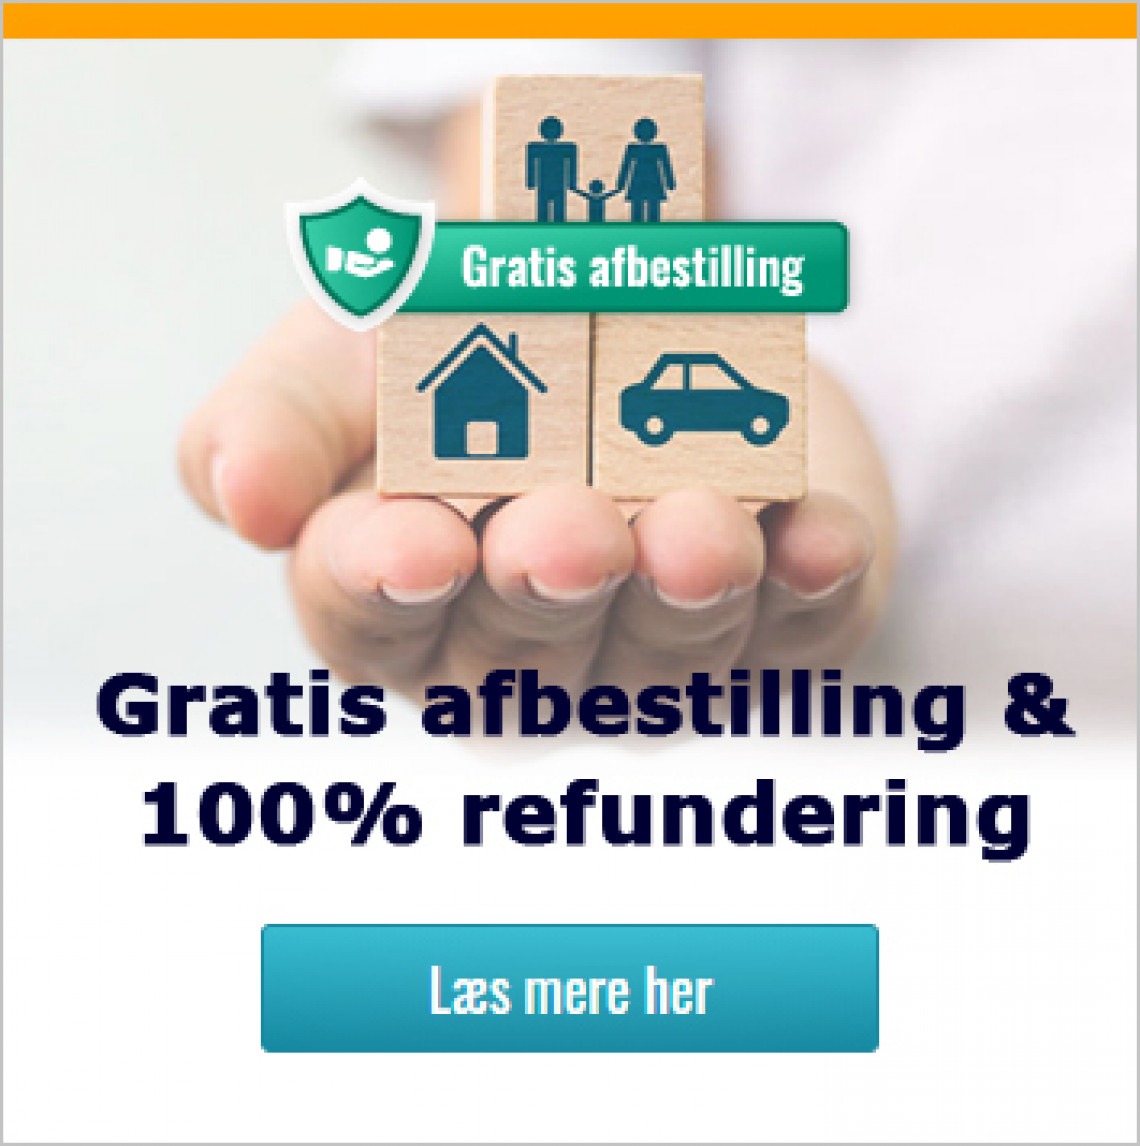 dansk bilferie, gratis afbestilling